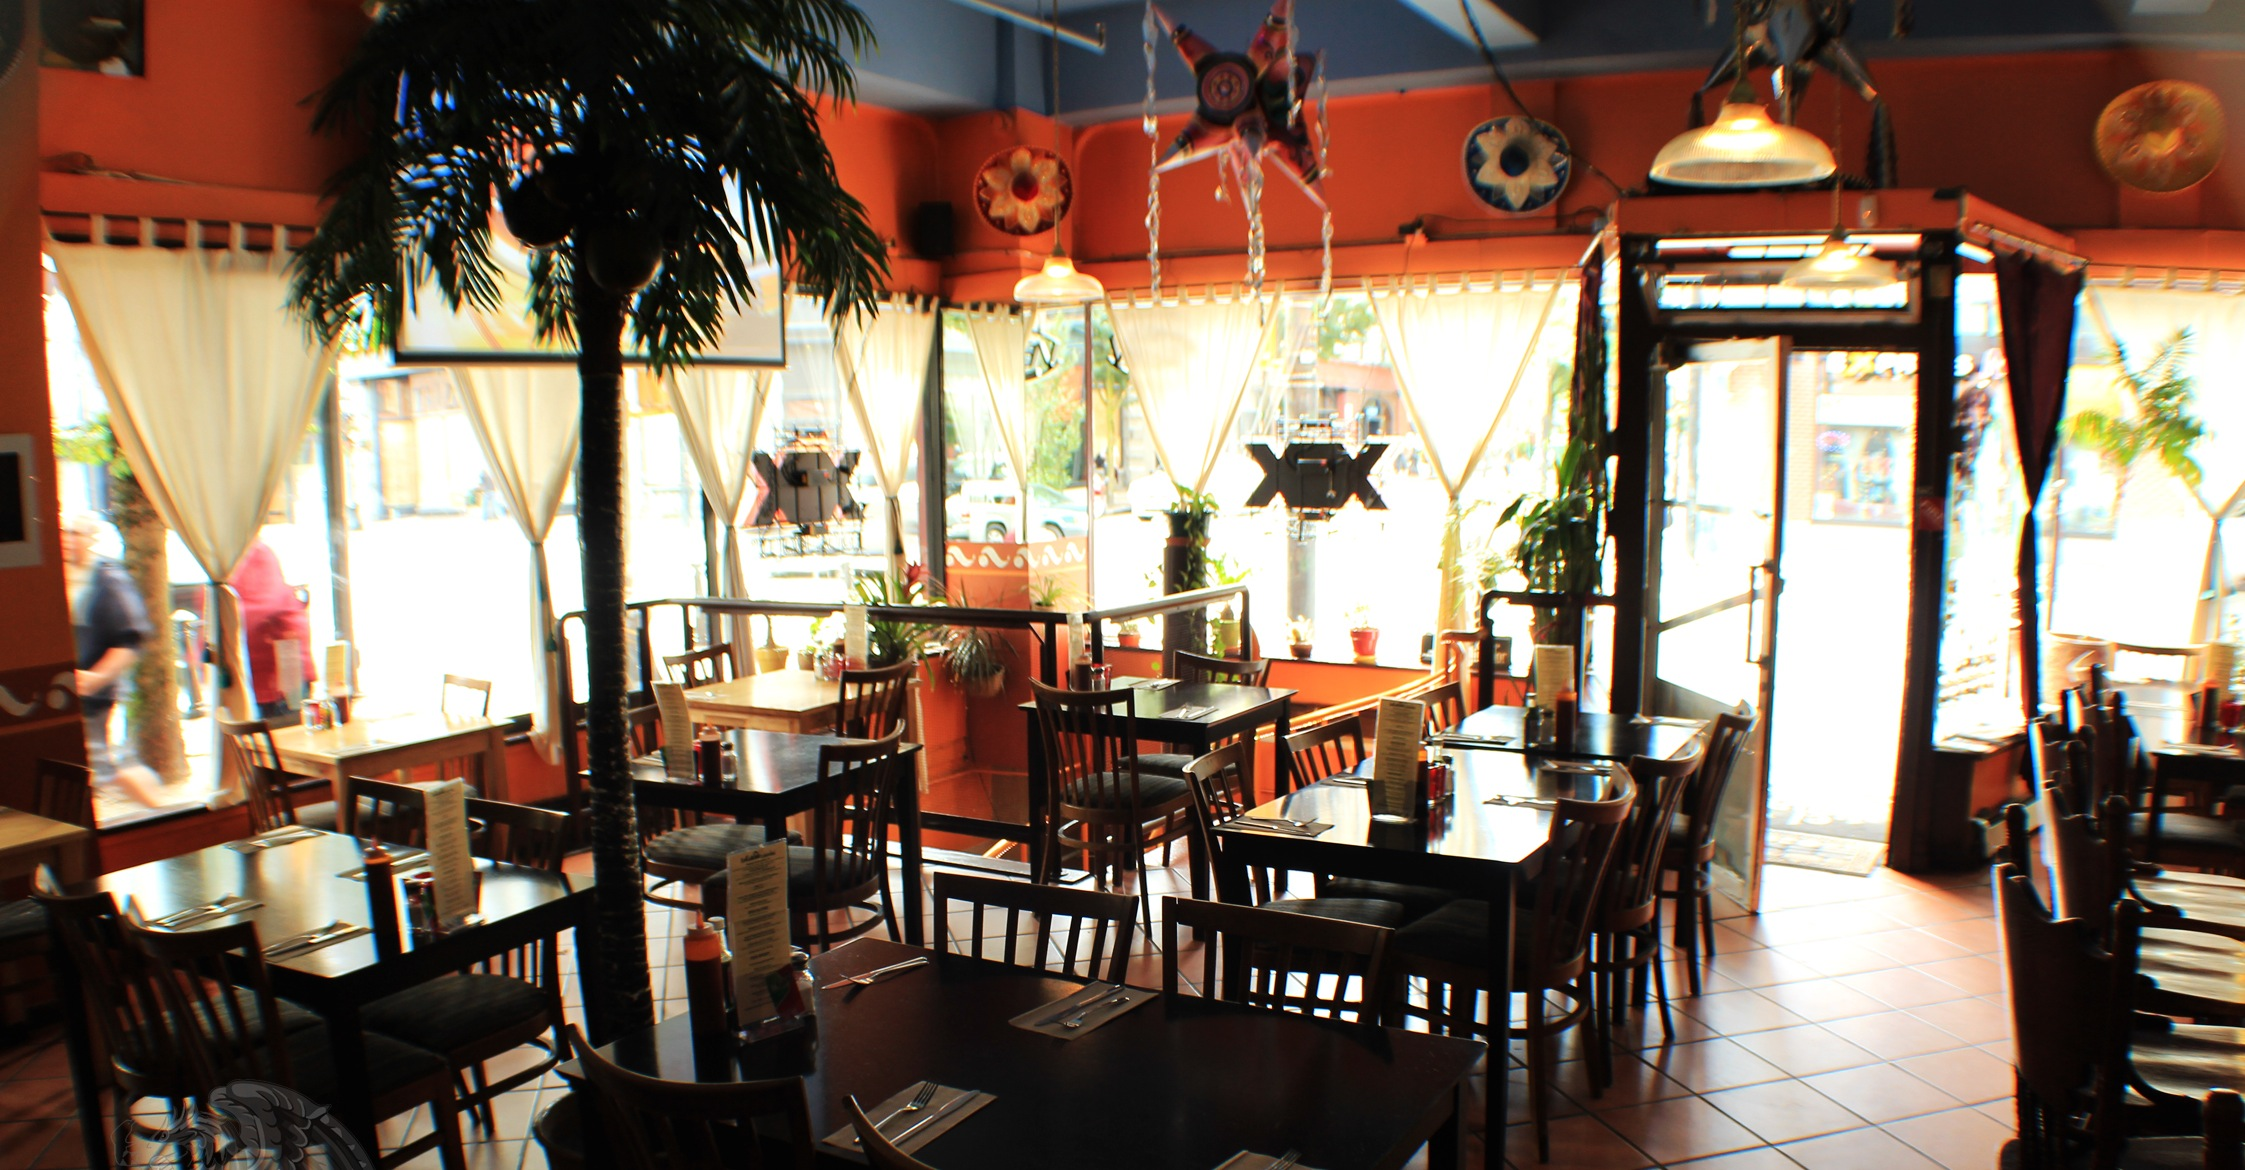 la-castia-gastown-restaurants